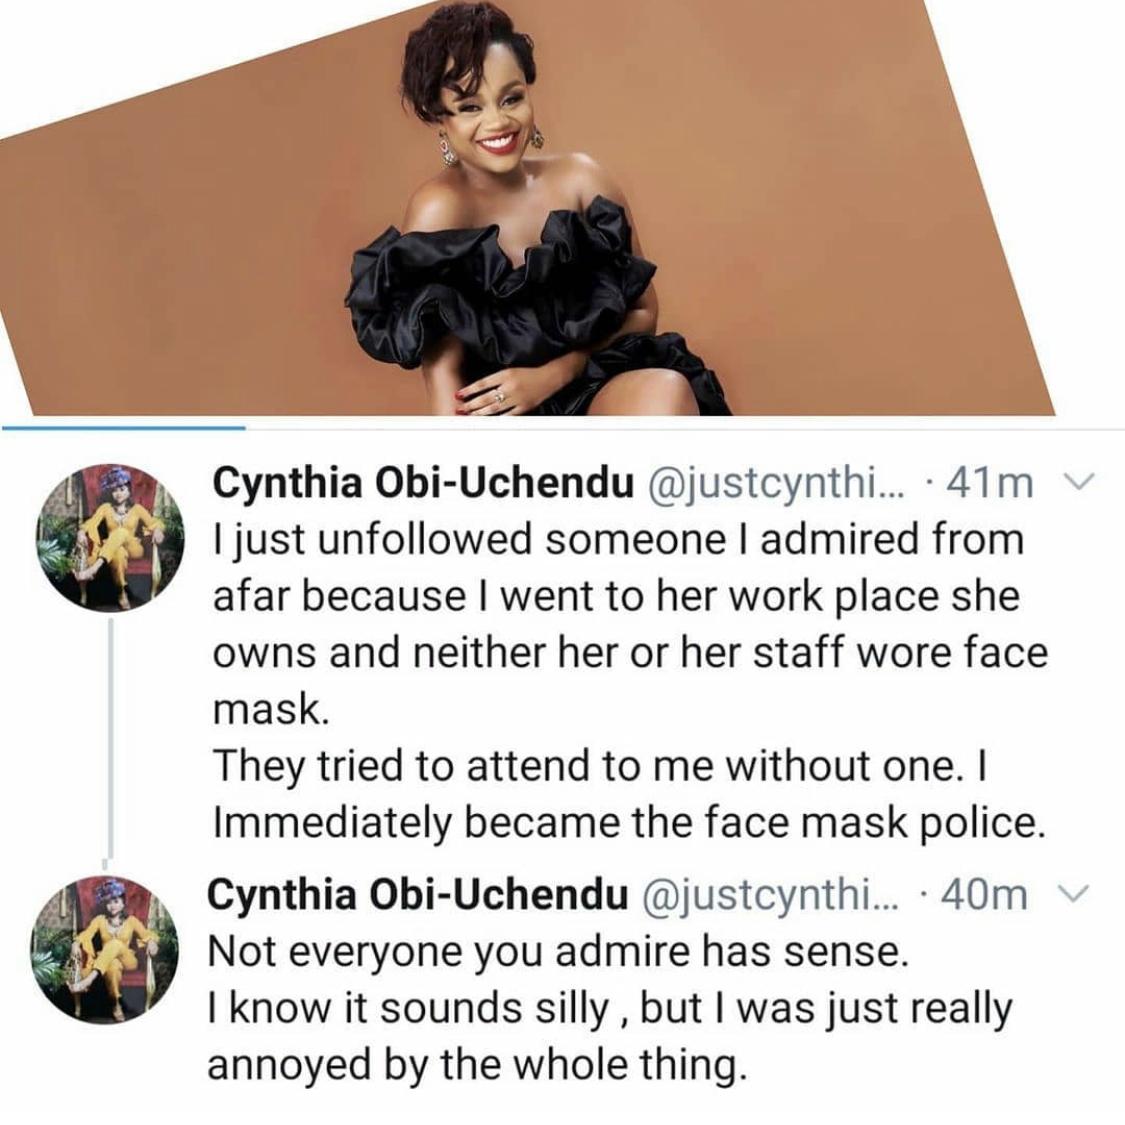 Obi-Uchendu's tweets